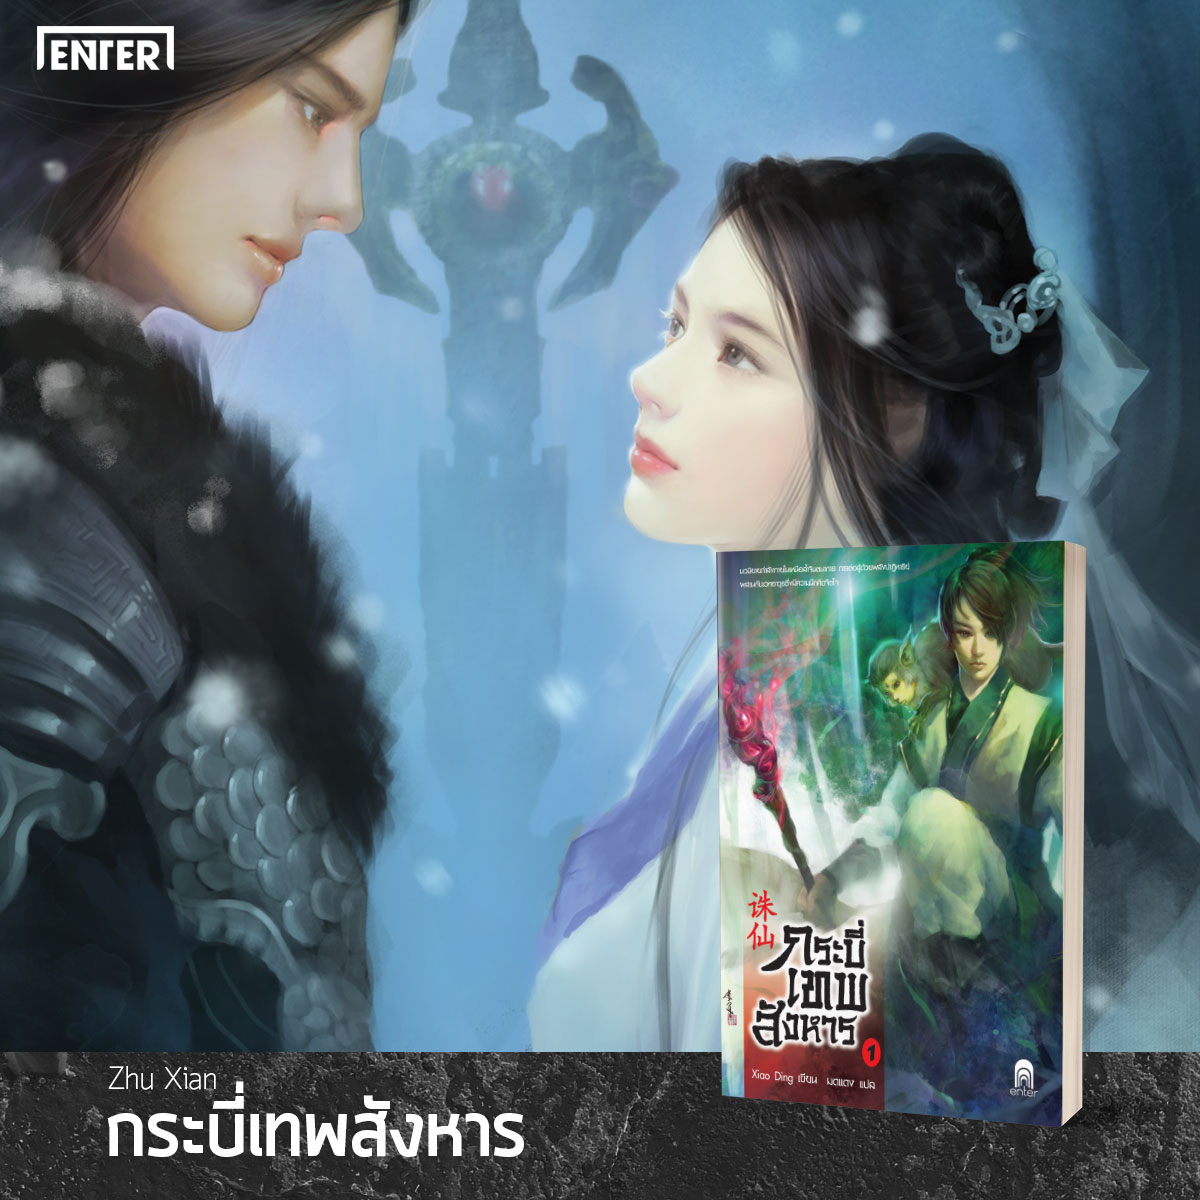 Enter_Movies_ZhuXian